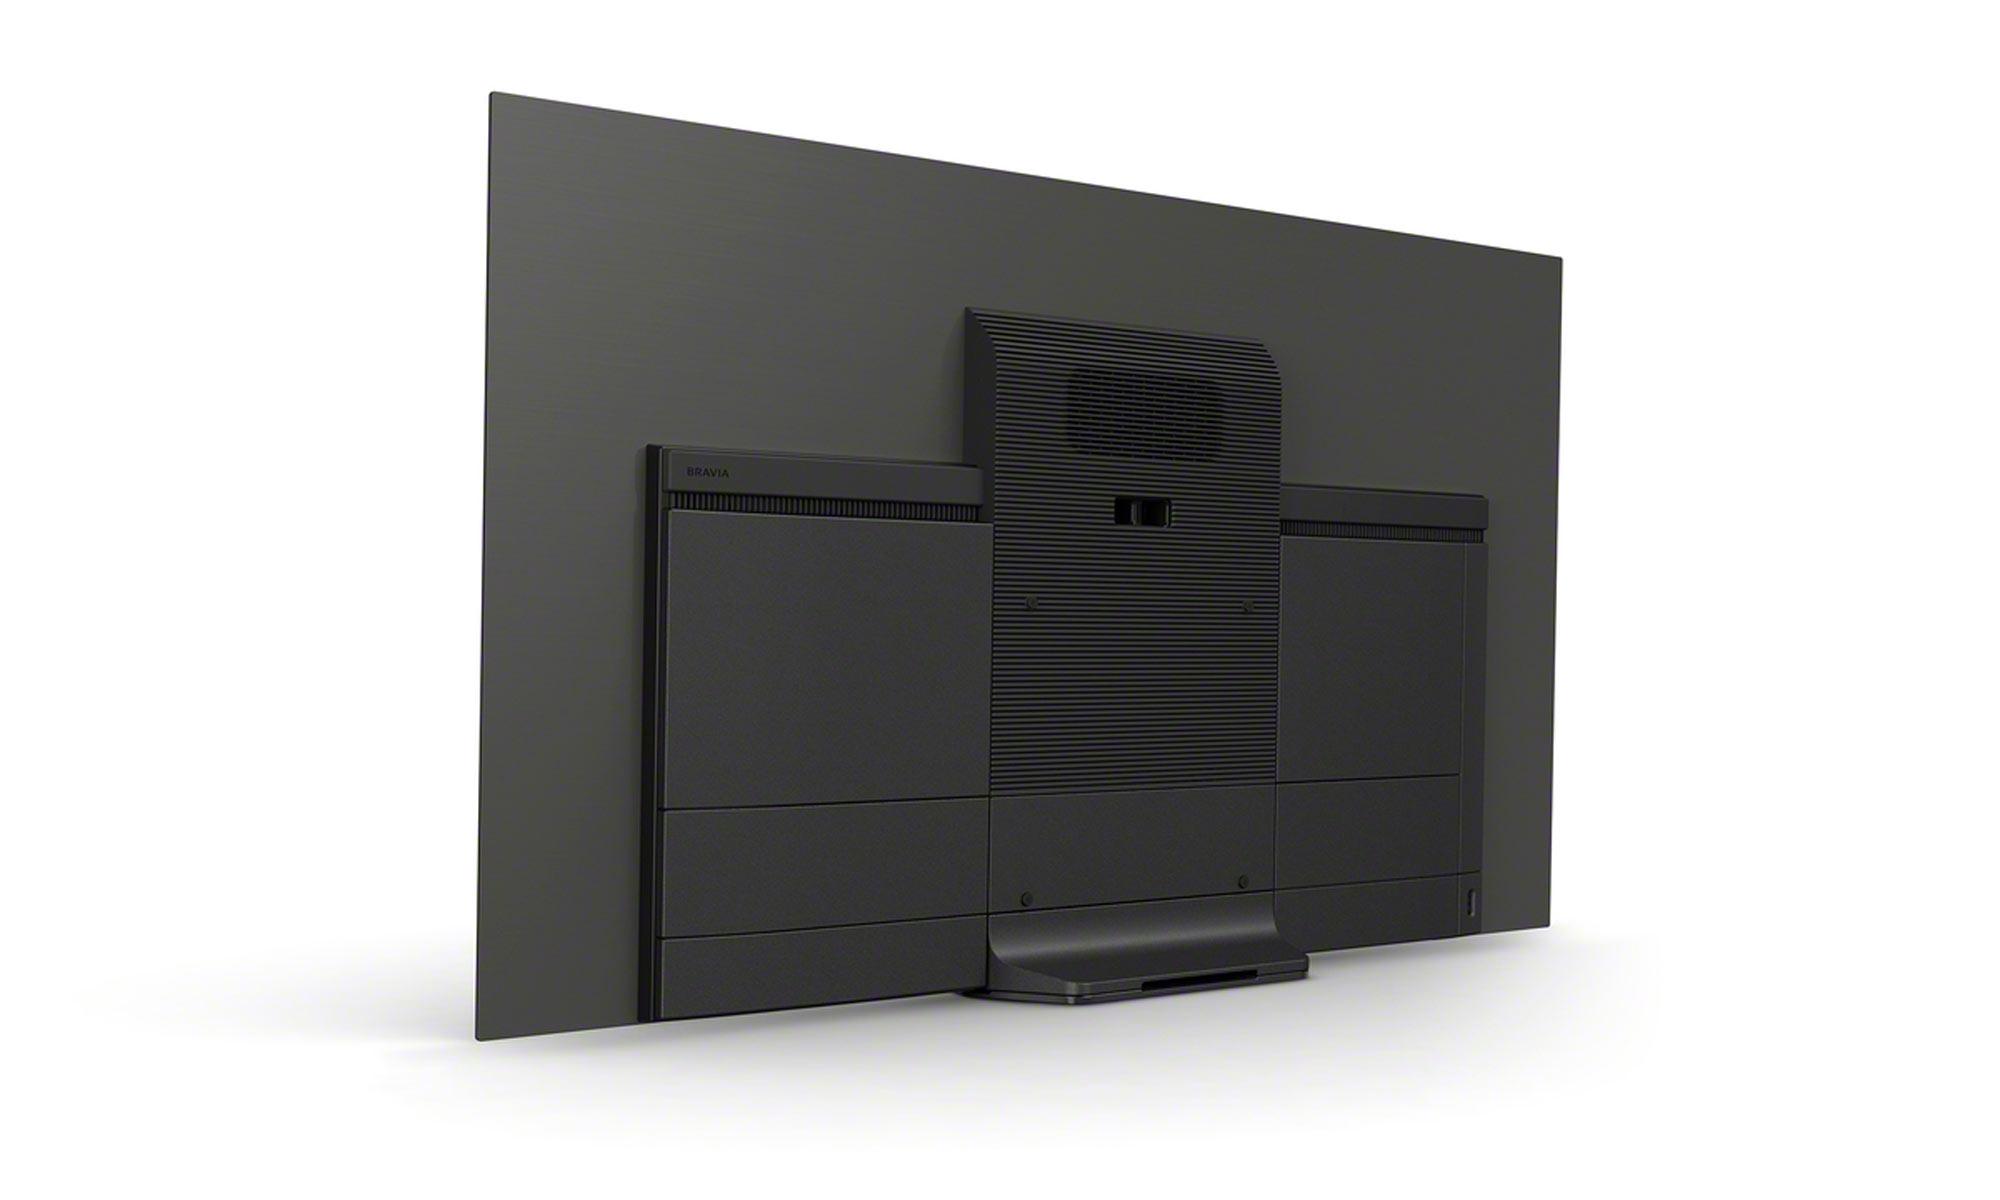 Sony Bravia AF8 OLED A8F Ultra HD 4K HDR10 Plus Smart TV 2018 Back